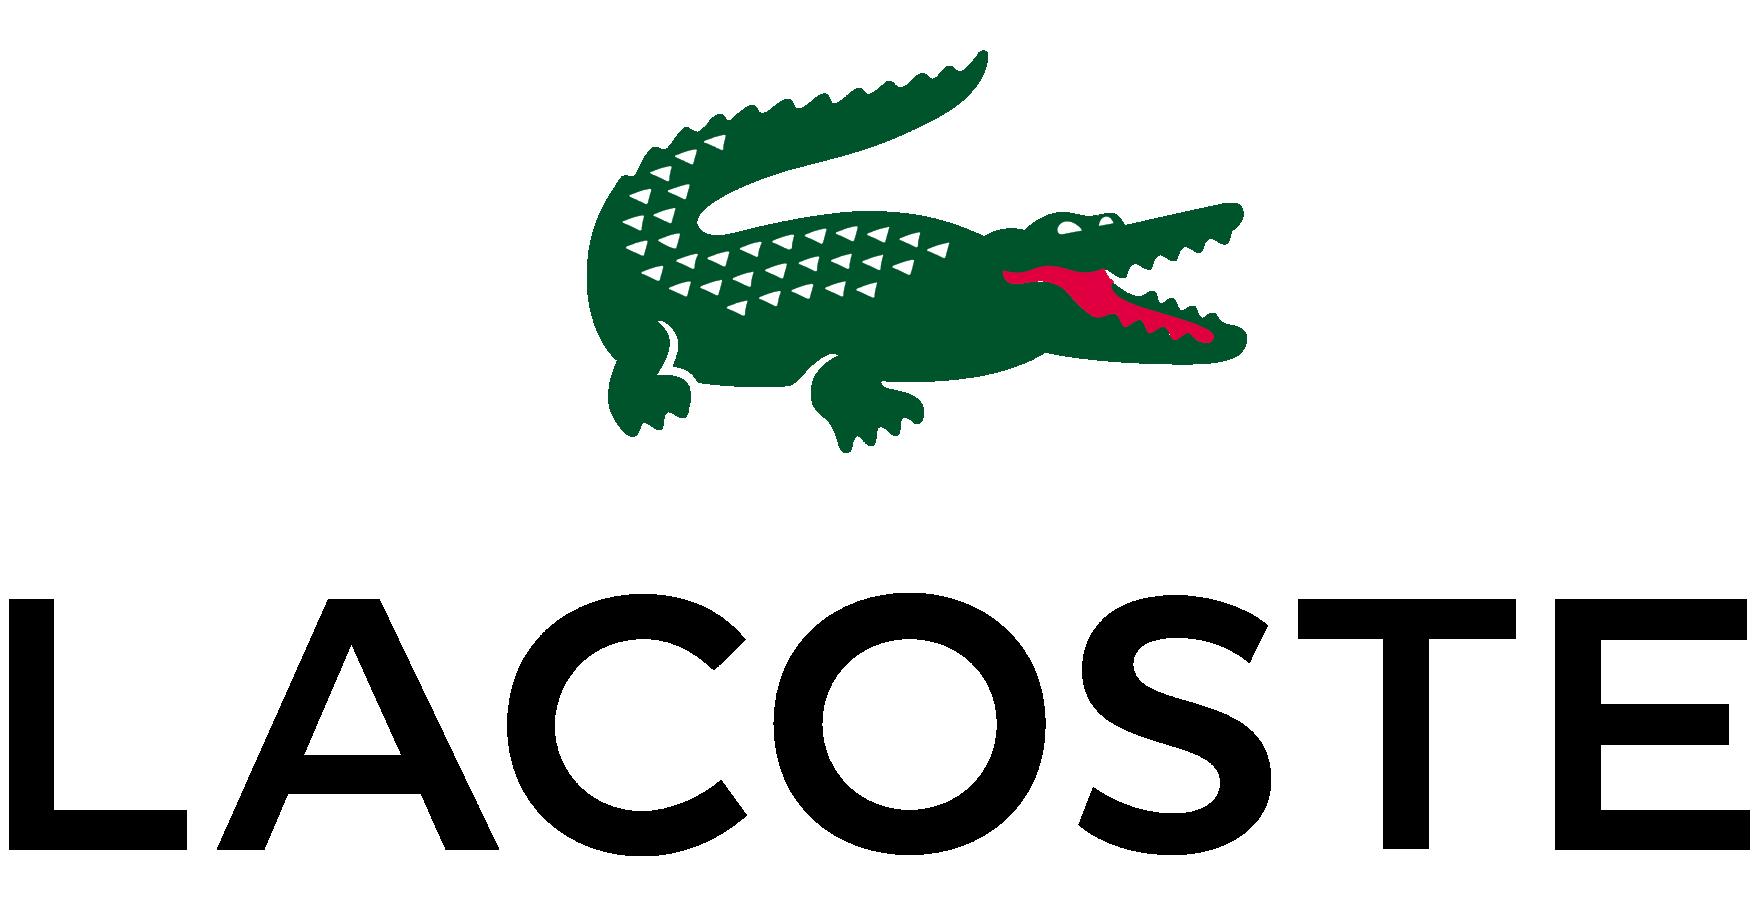 Lacoste_logo_symbol_crocodile